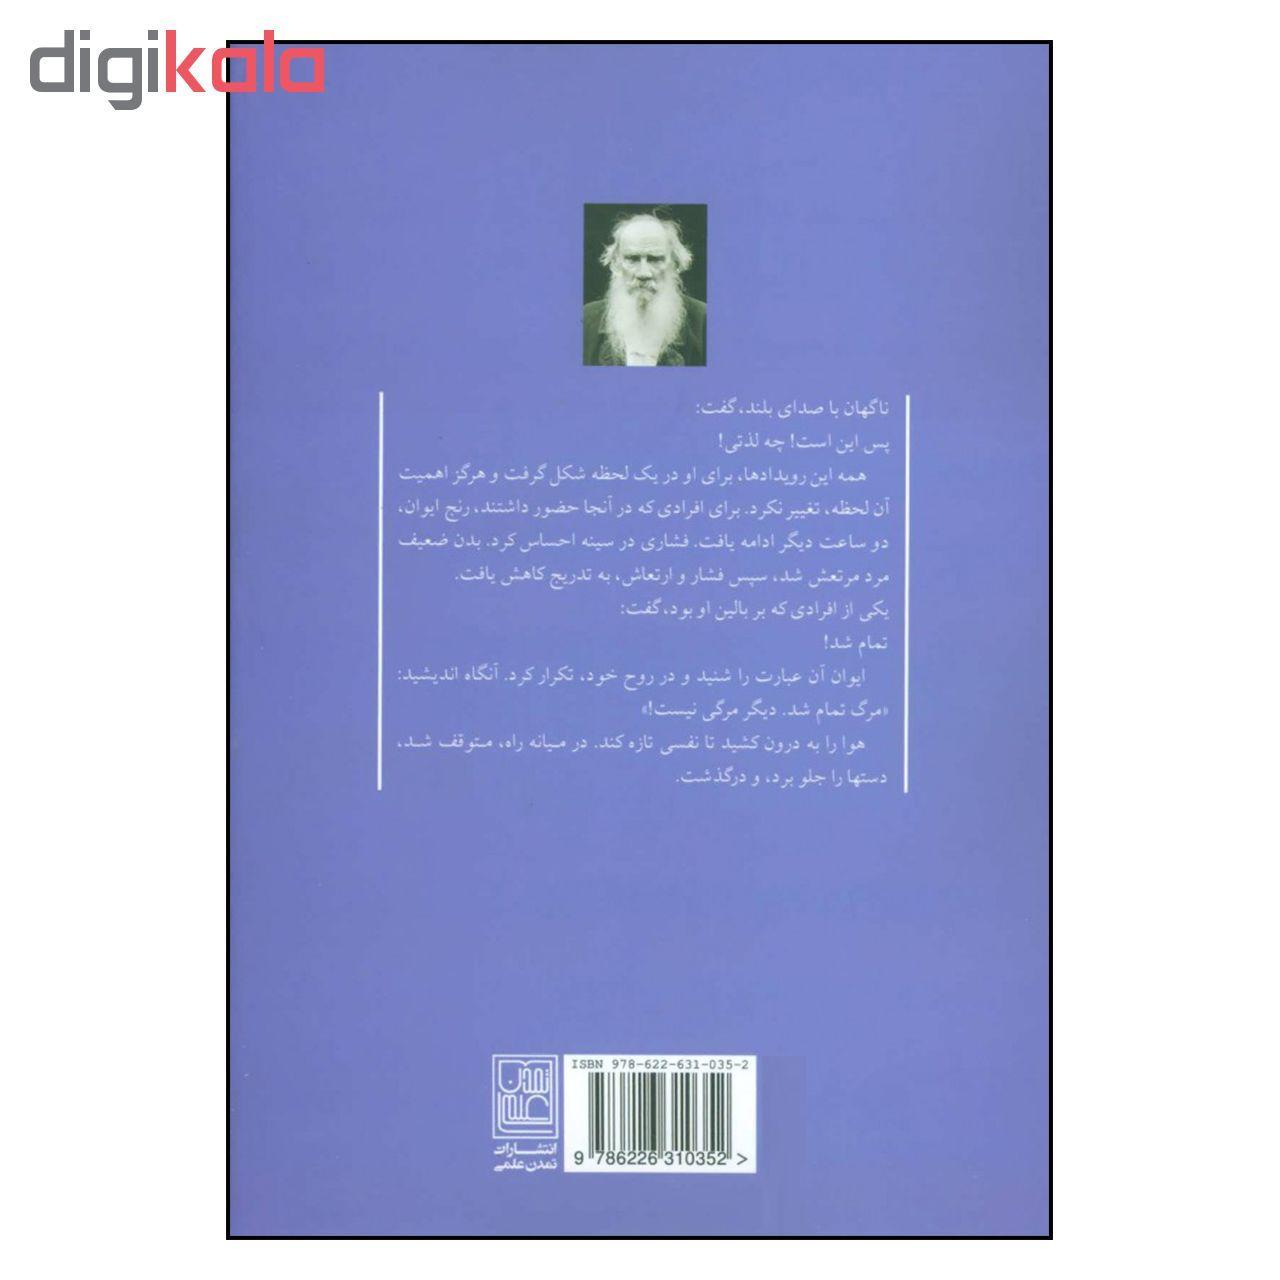 کتاب مرگ ایوان ایلیچ اثر لئو تولستوی نشر تمدن علمی  main 1 2